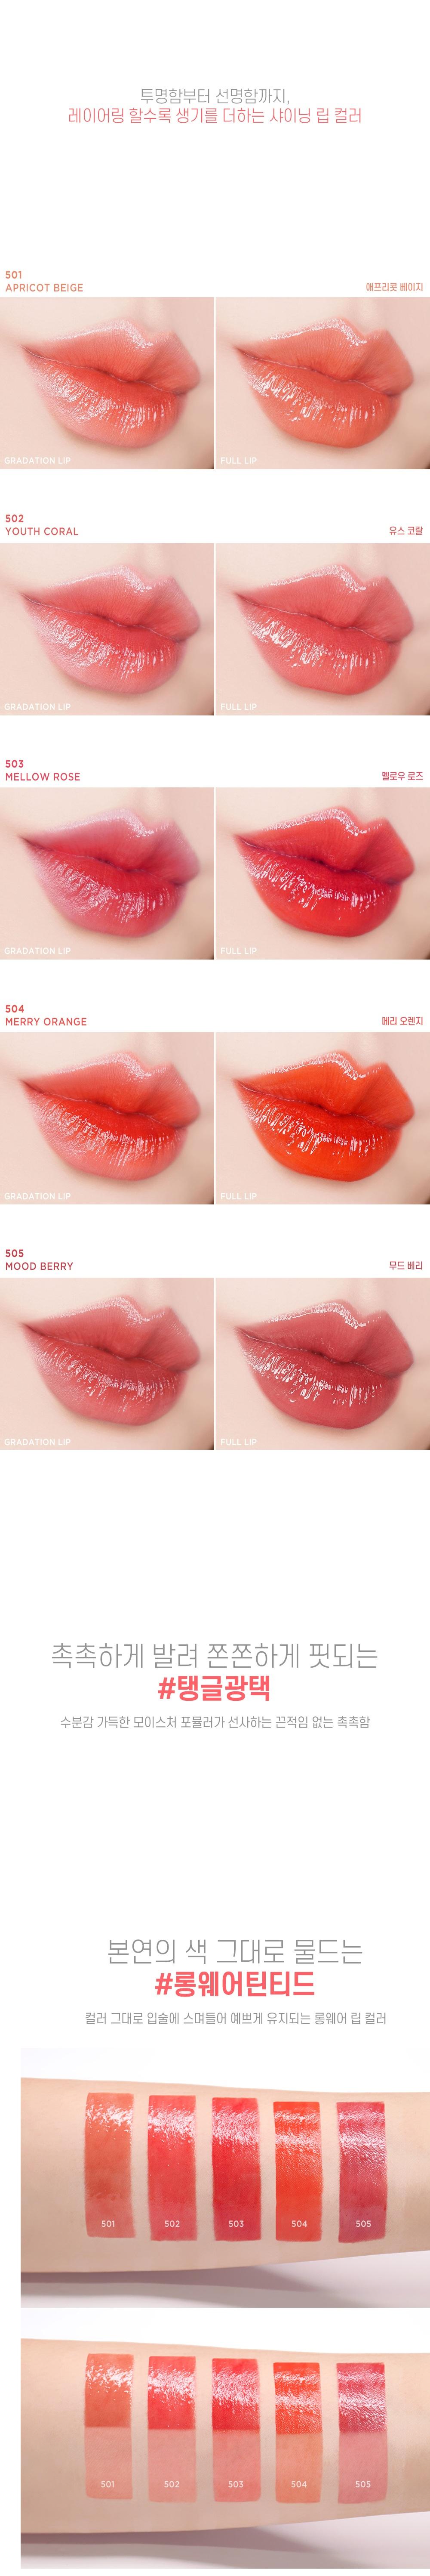 Moonshot Tint Fit Shine korean skincare product online shop malaysia China macau3